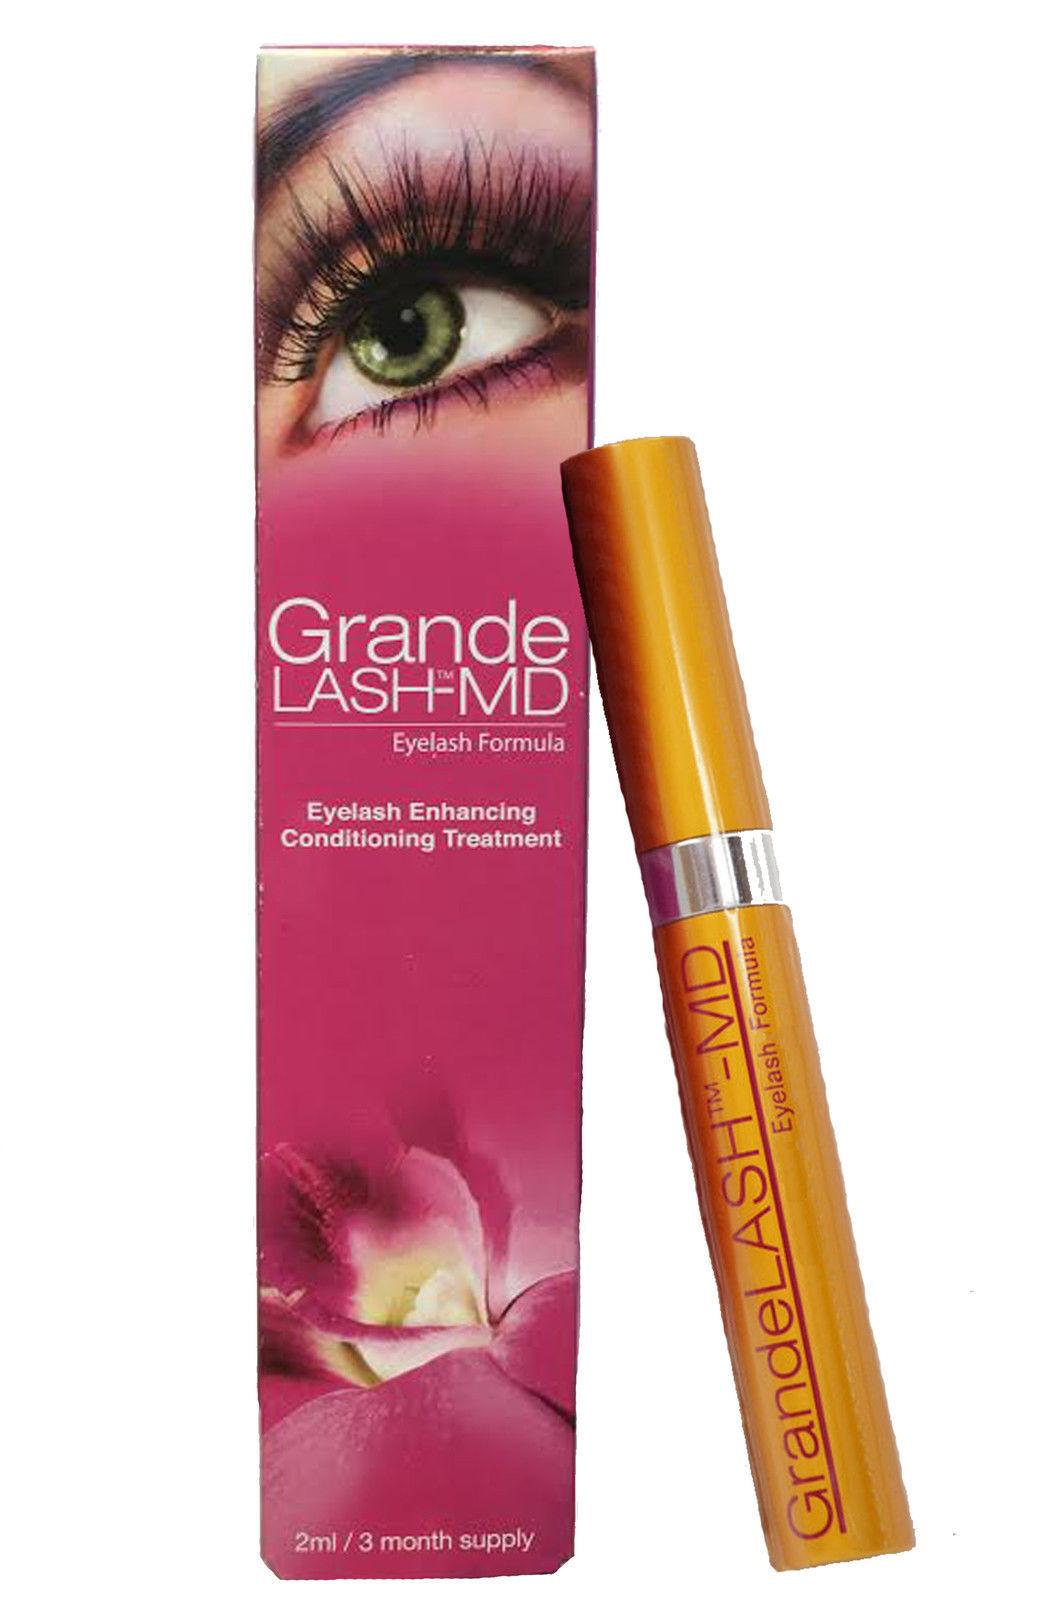 Grandelash Md Eyelash Enhancing Conditioning Treatment 2ml Ebay